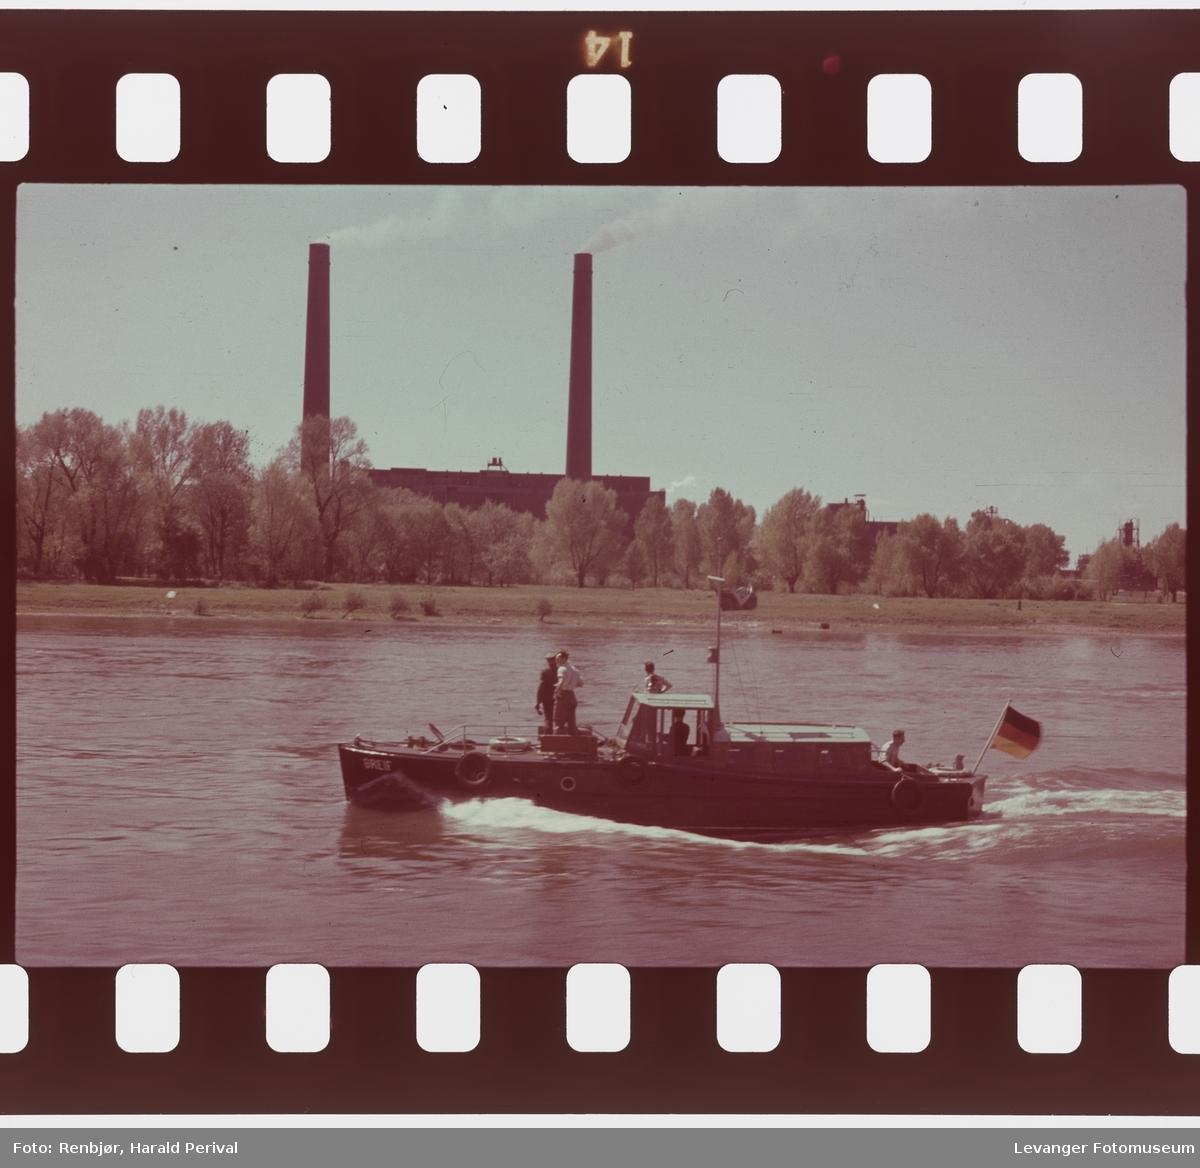 Fra Tyskland i forbindelse med deltakingen på den årlige Fotomessen i Køln. Båt på Rhinen med fabrikkpiper på elvebredden.